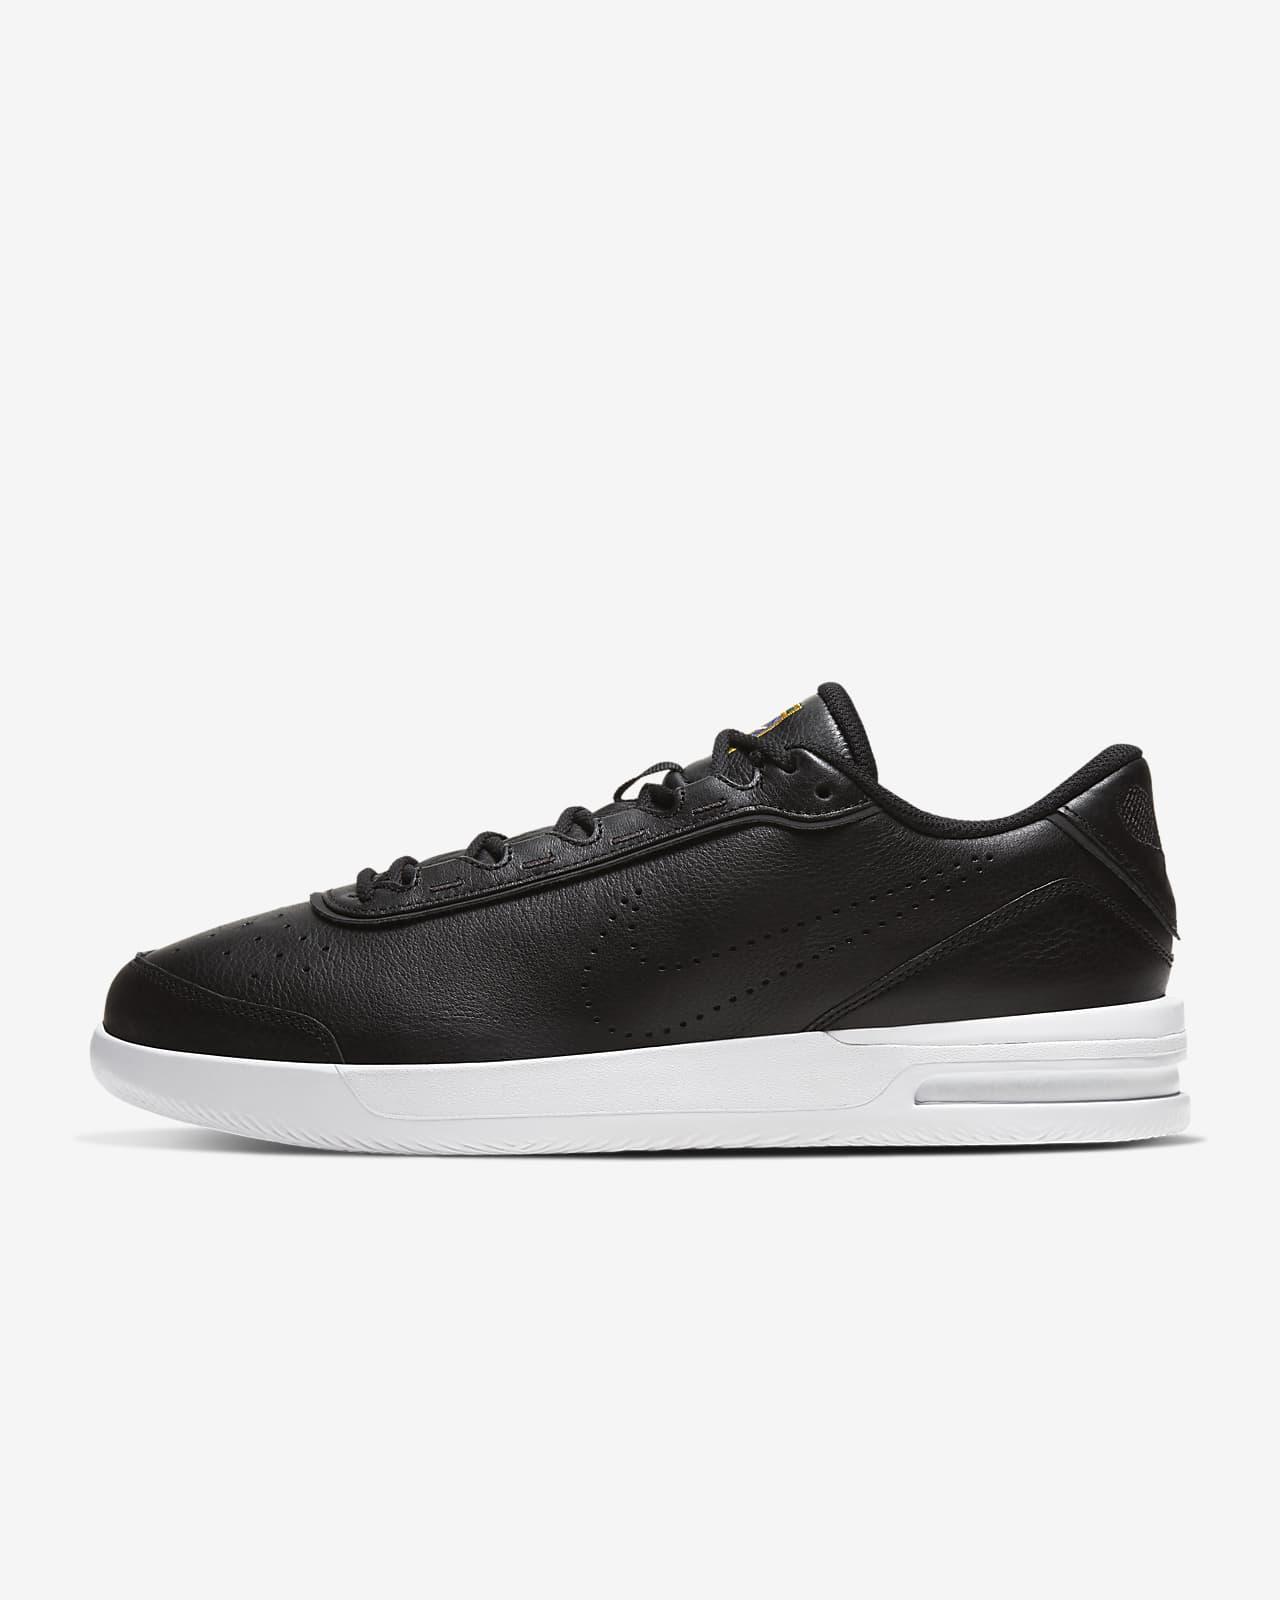 NikeCourt Air Max Vapor Wing Premium Zapatillas de tenis - Hombre